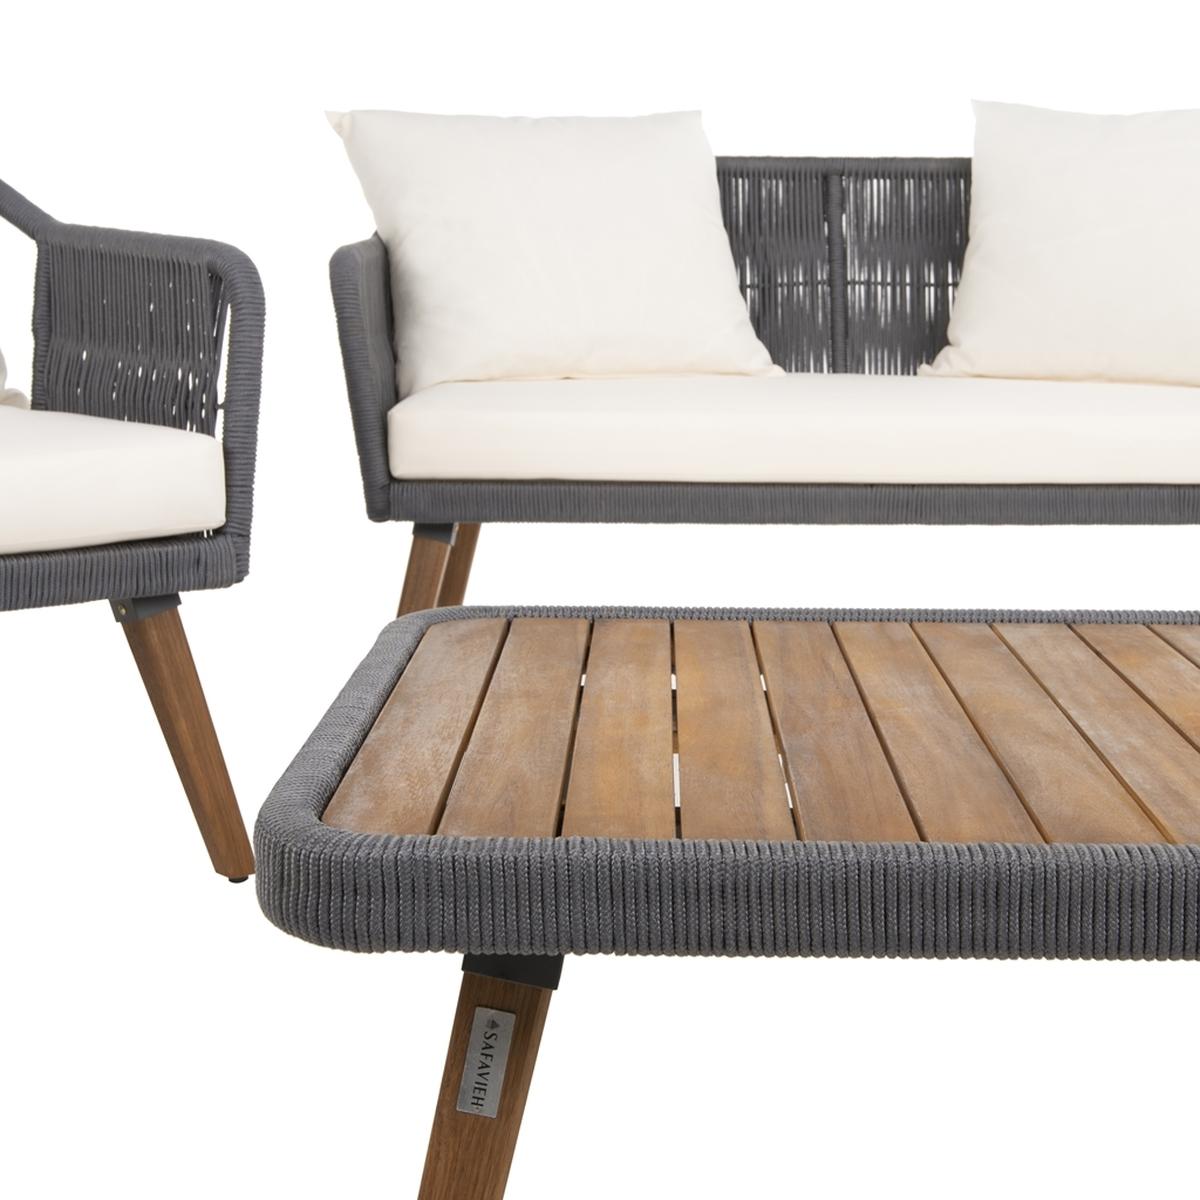 PAT7049A Patio Sets - 4 Piece - Furniture by Safavieh on Safavieh Raldin id=83399